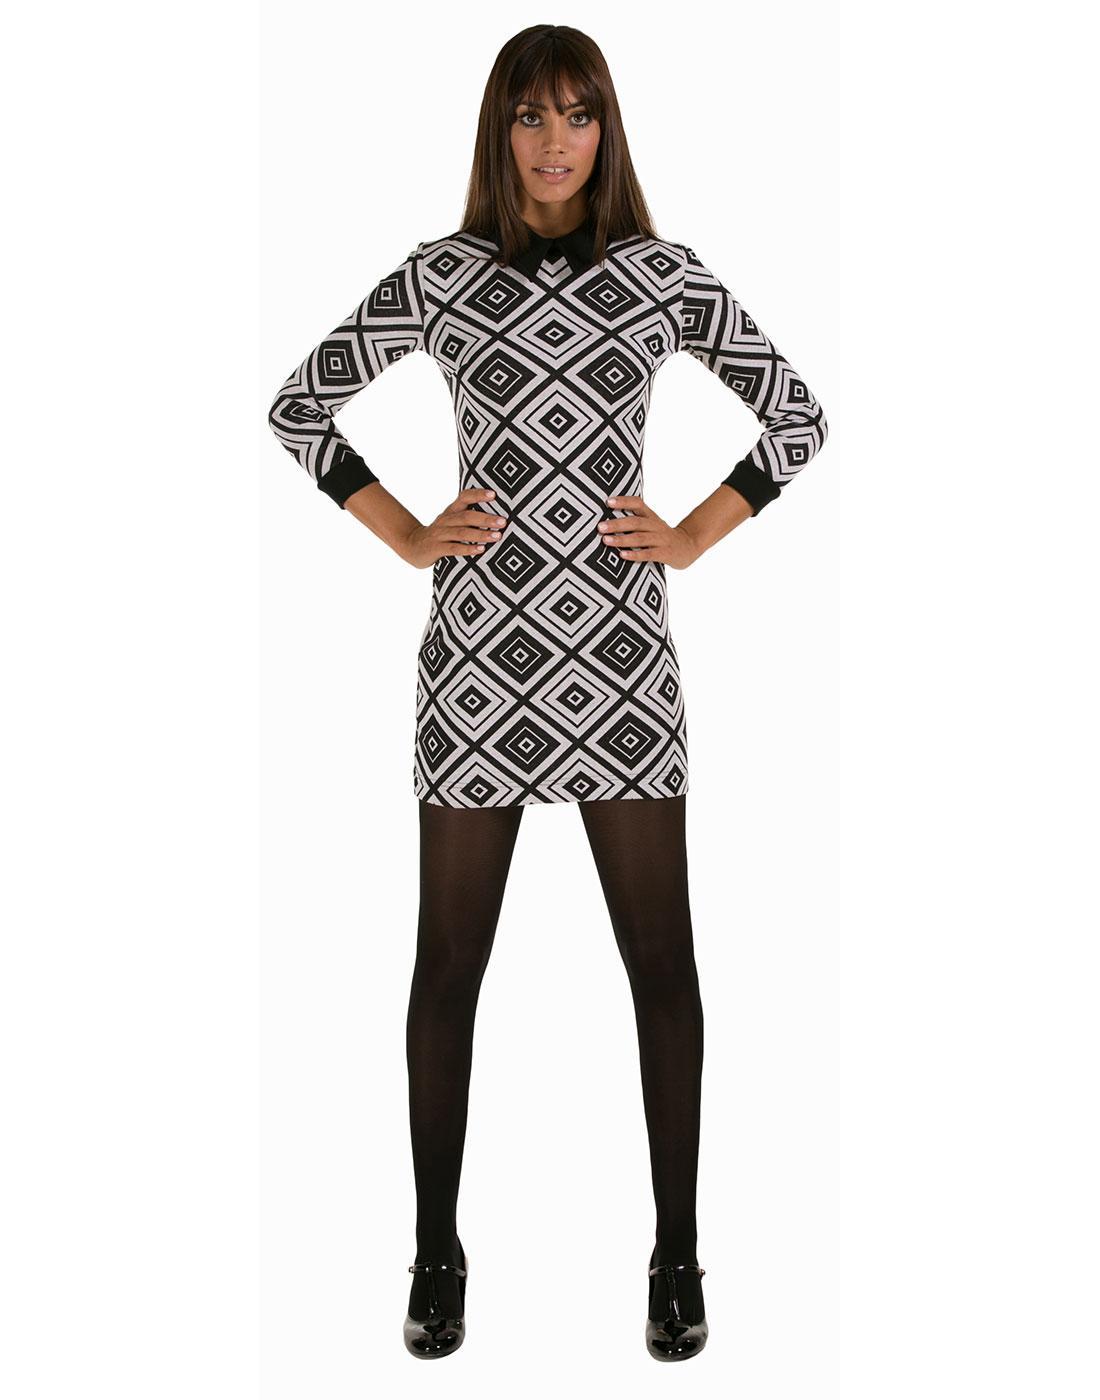 MARMALADE Retro Mod Diamond Pattern Collar Dress